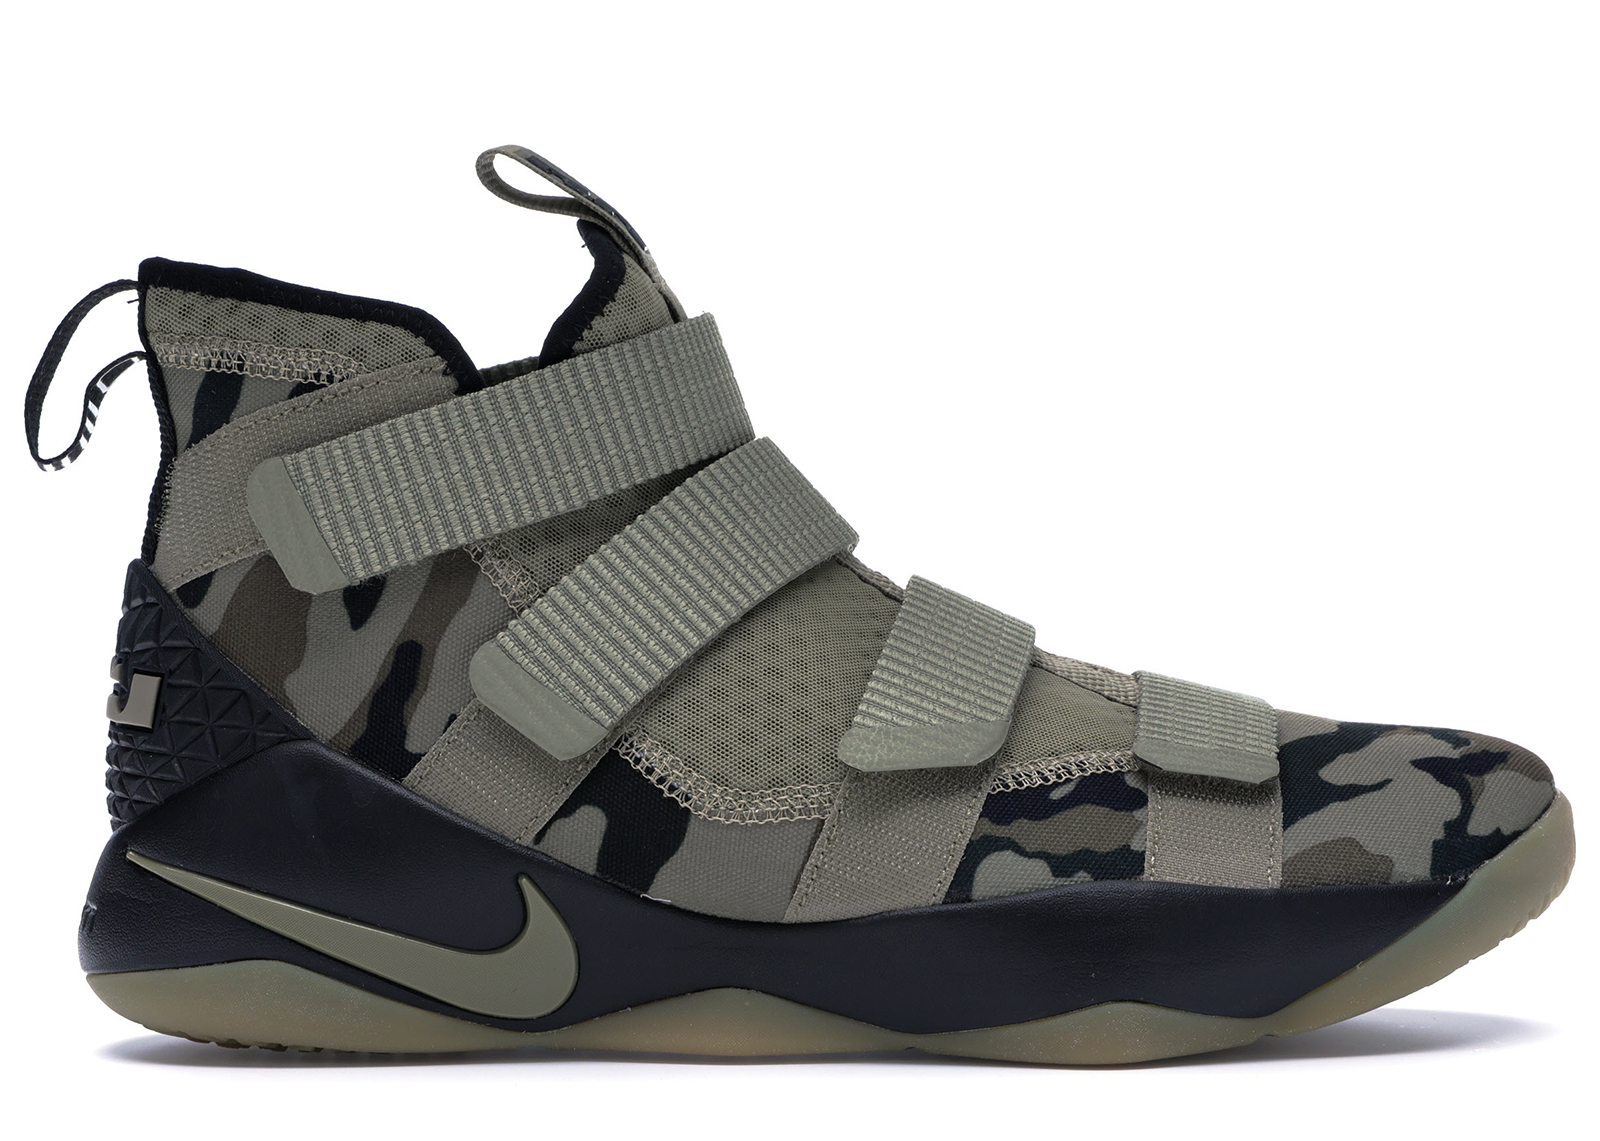 Nike LeBron Zoom Soldier 11 Camo